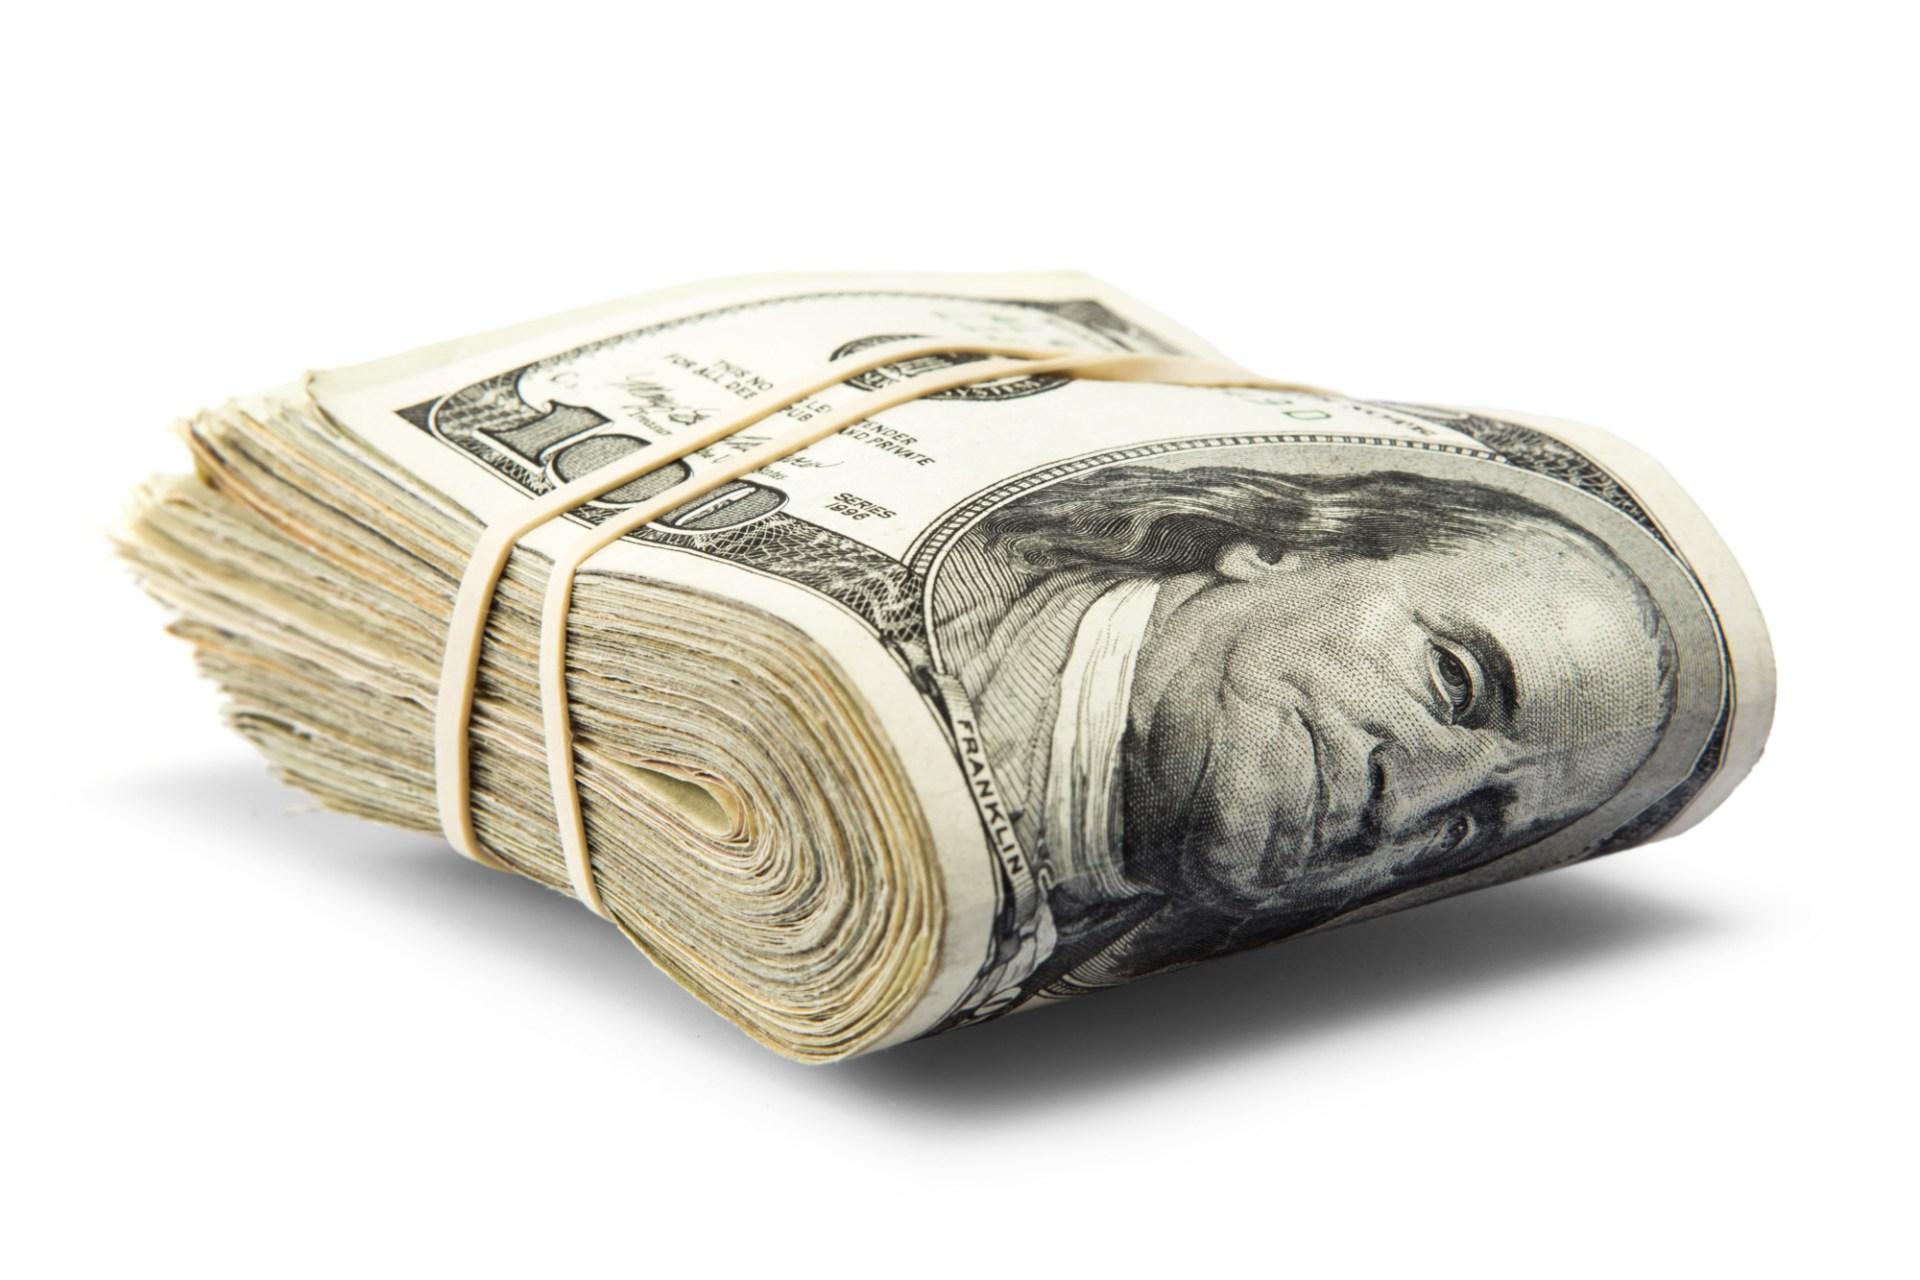 All-Cash Offer